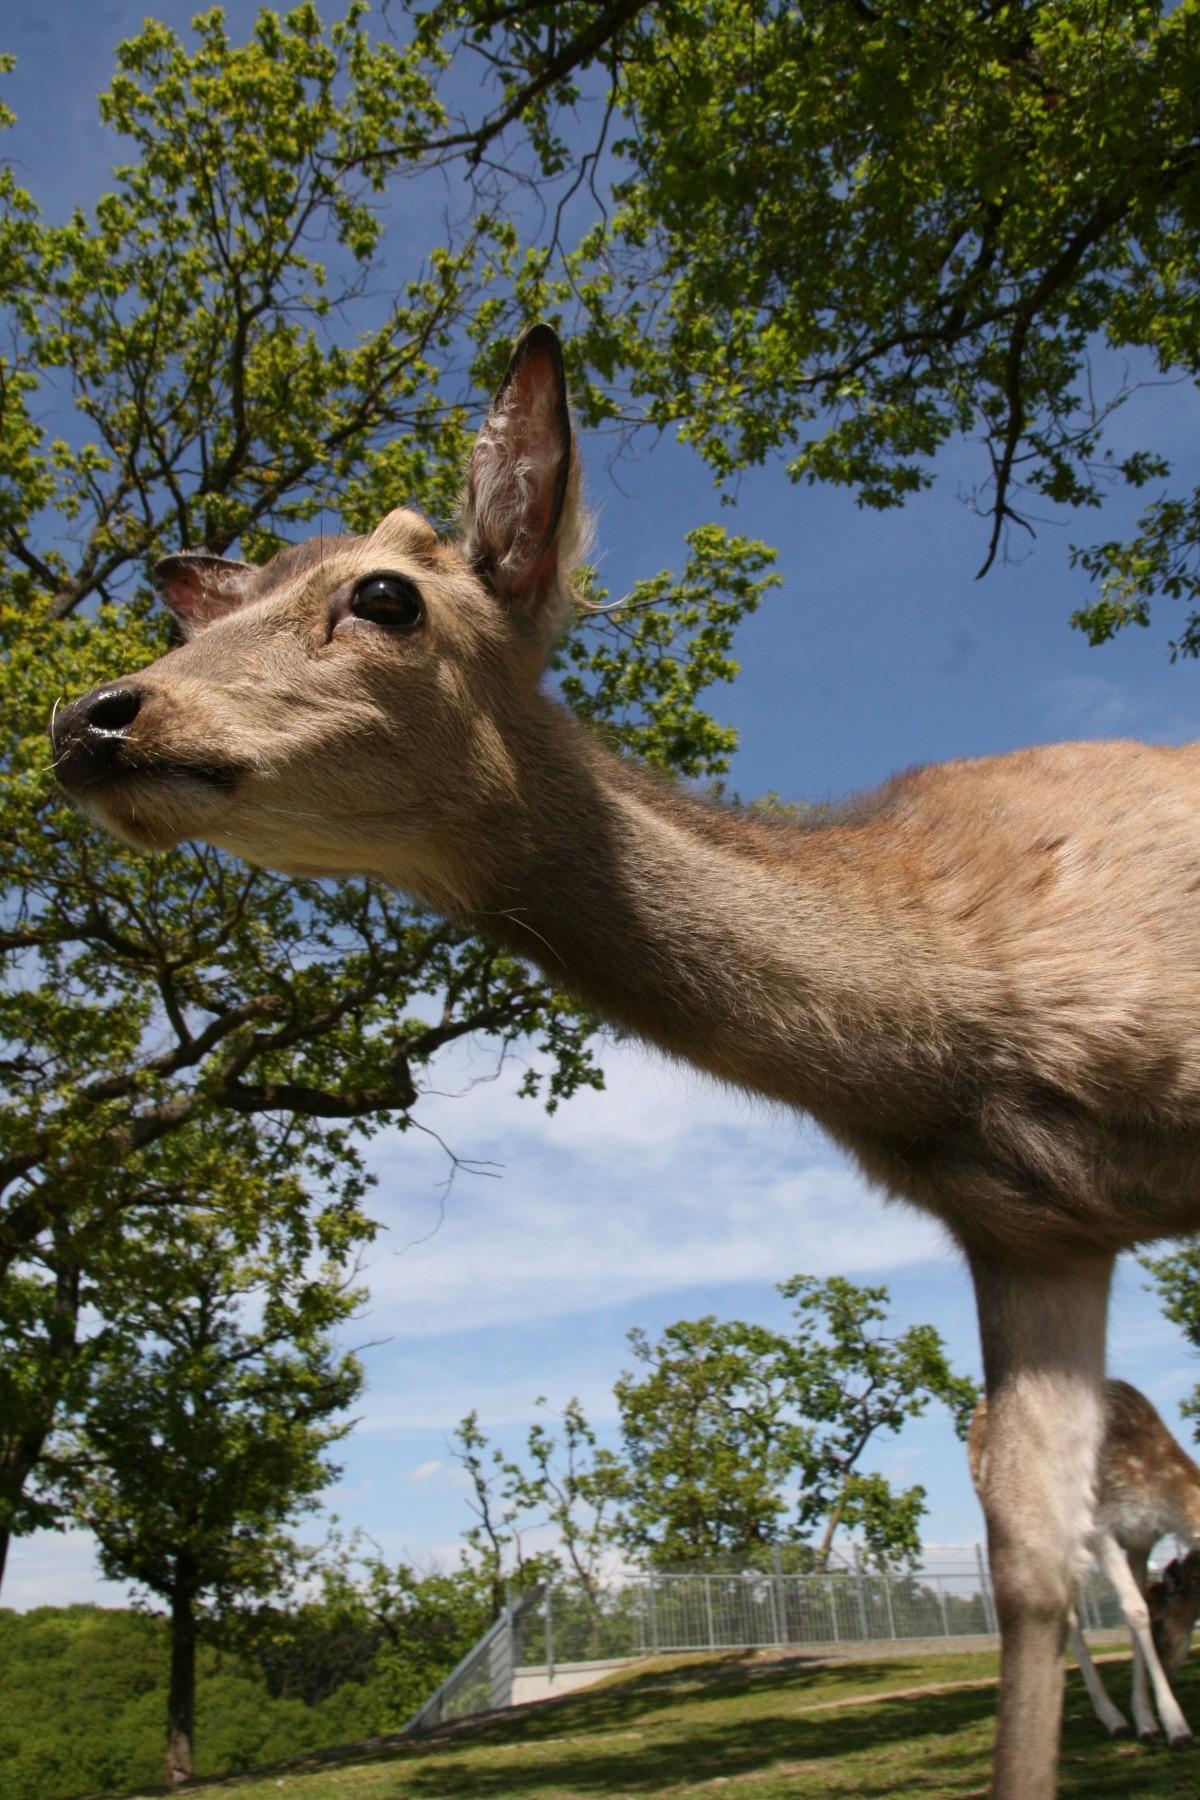 Free wildlife wild zoo mammal close fauna sno